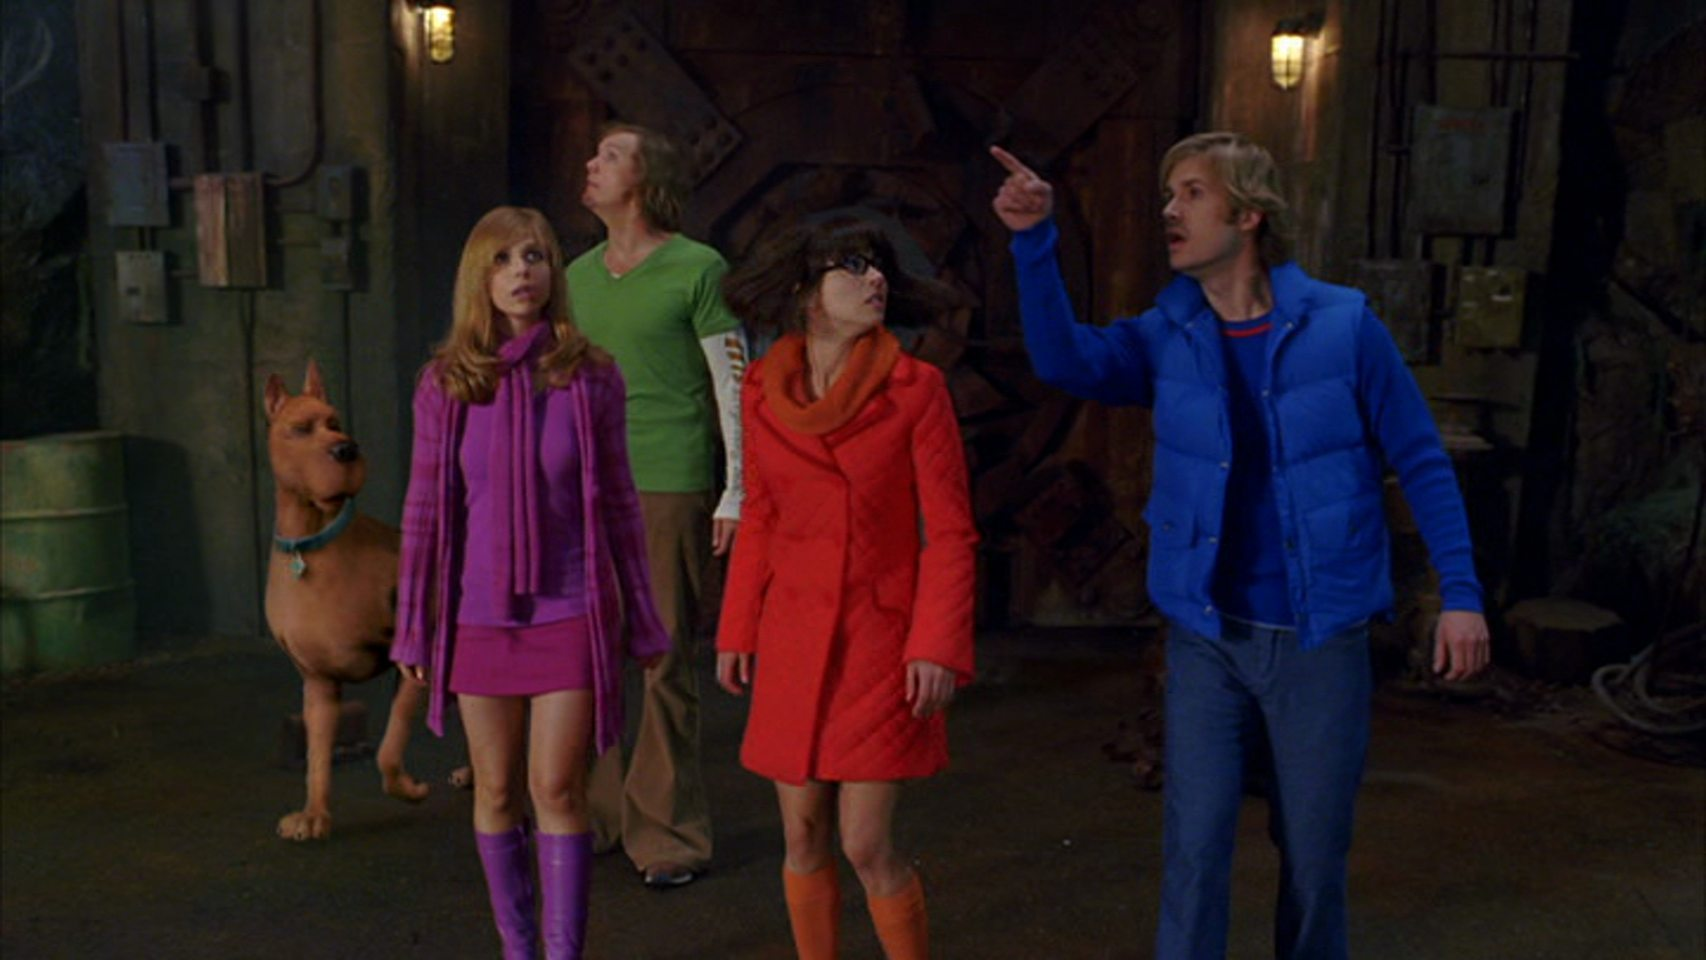 Scooby Doo 2 Monsters Unleashed Scooby Doo Image 21165888 Fanpop